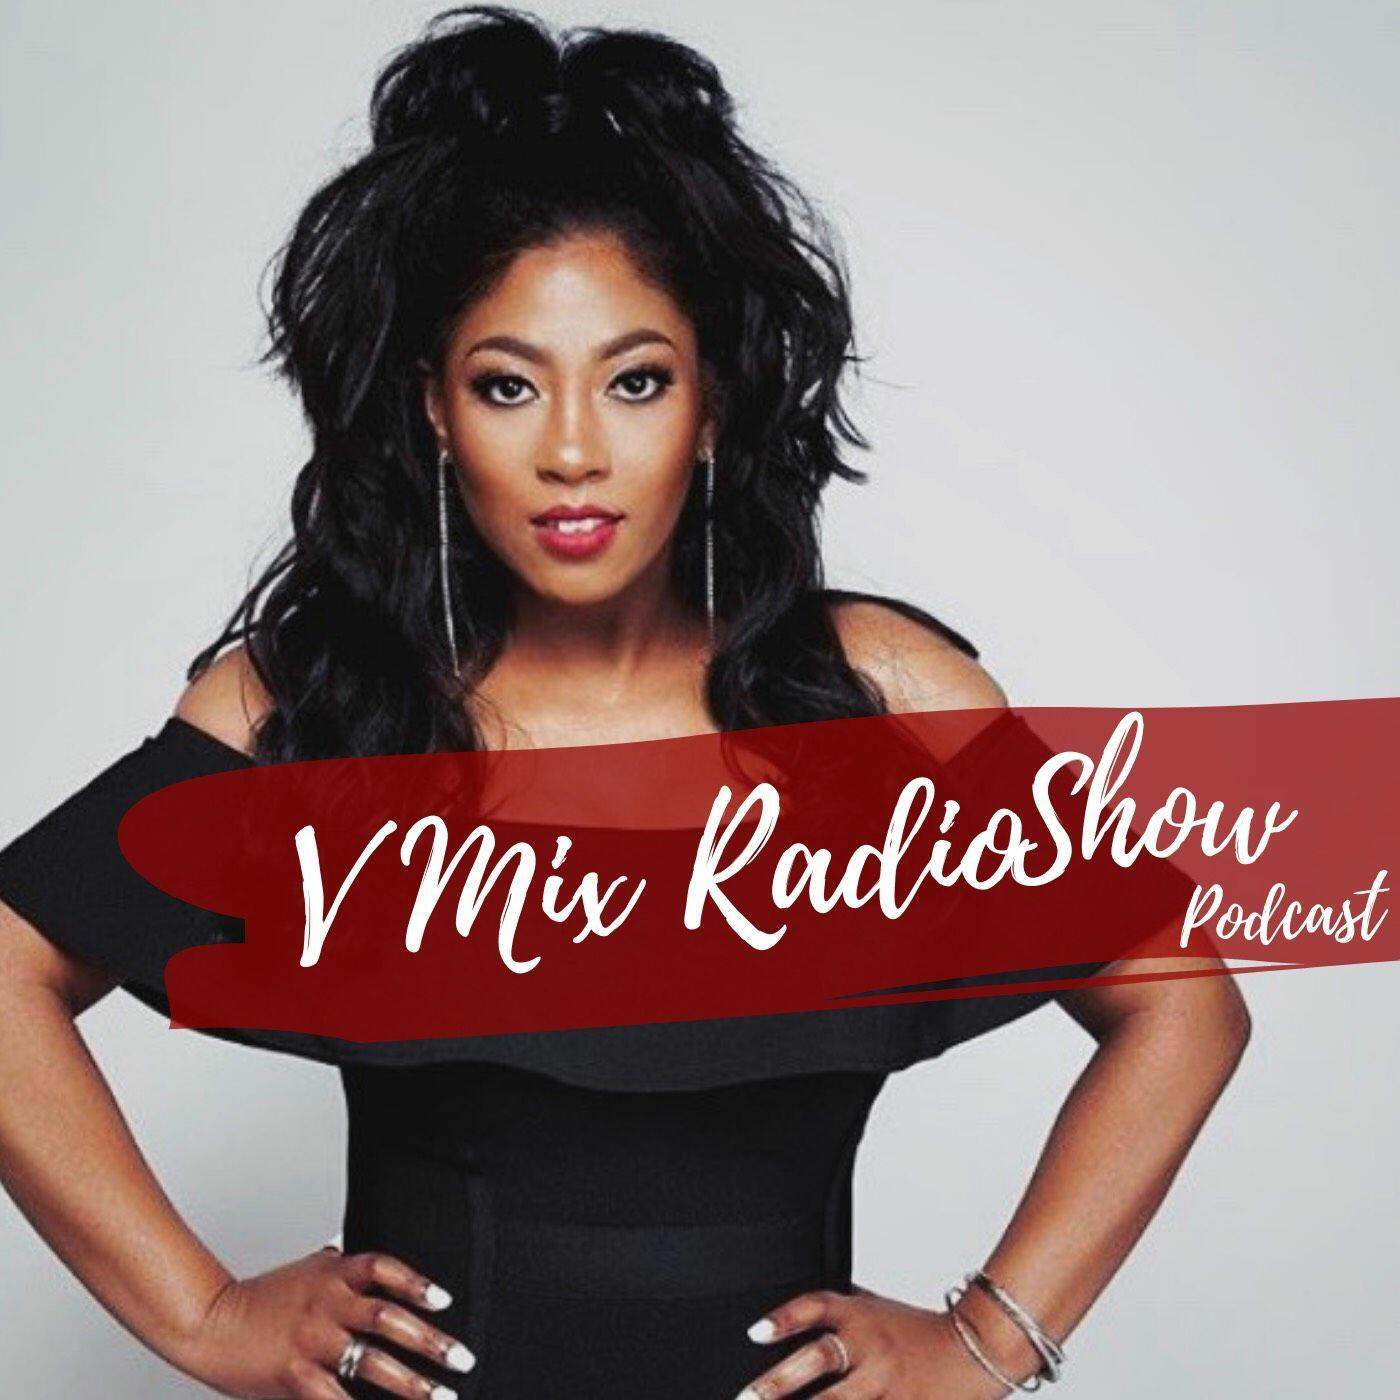 The VMix Radio Show Podcast